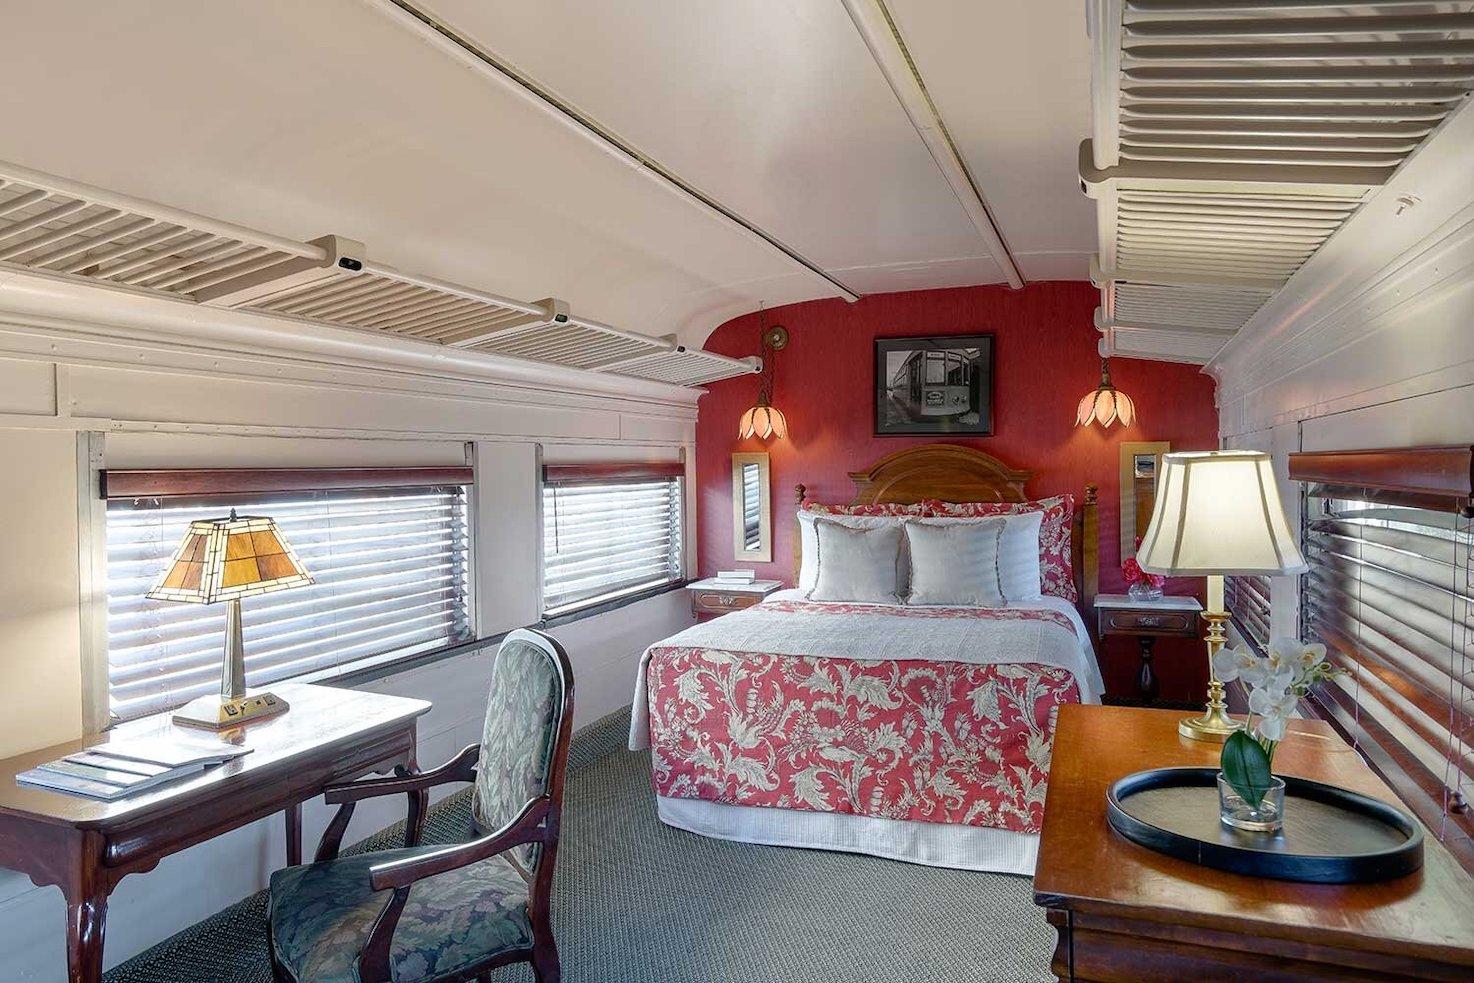 Pulman Train Car room Chattanooga Choo Choo Hotel.